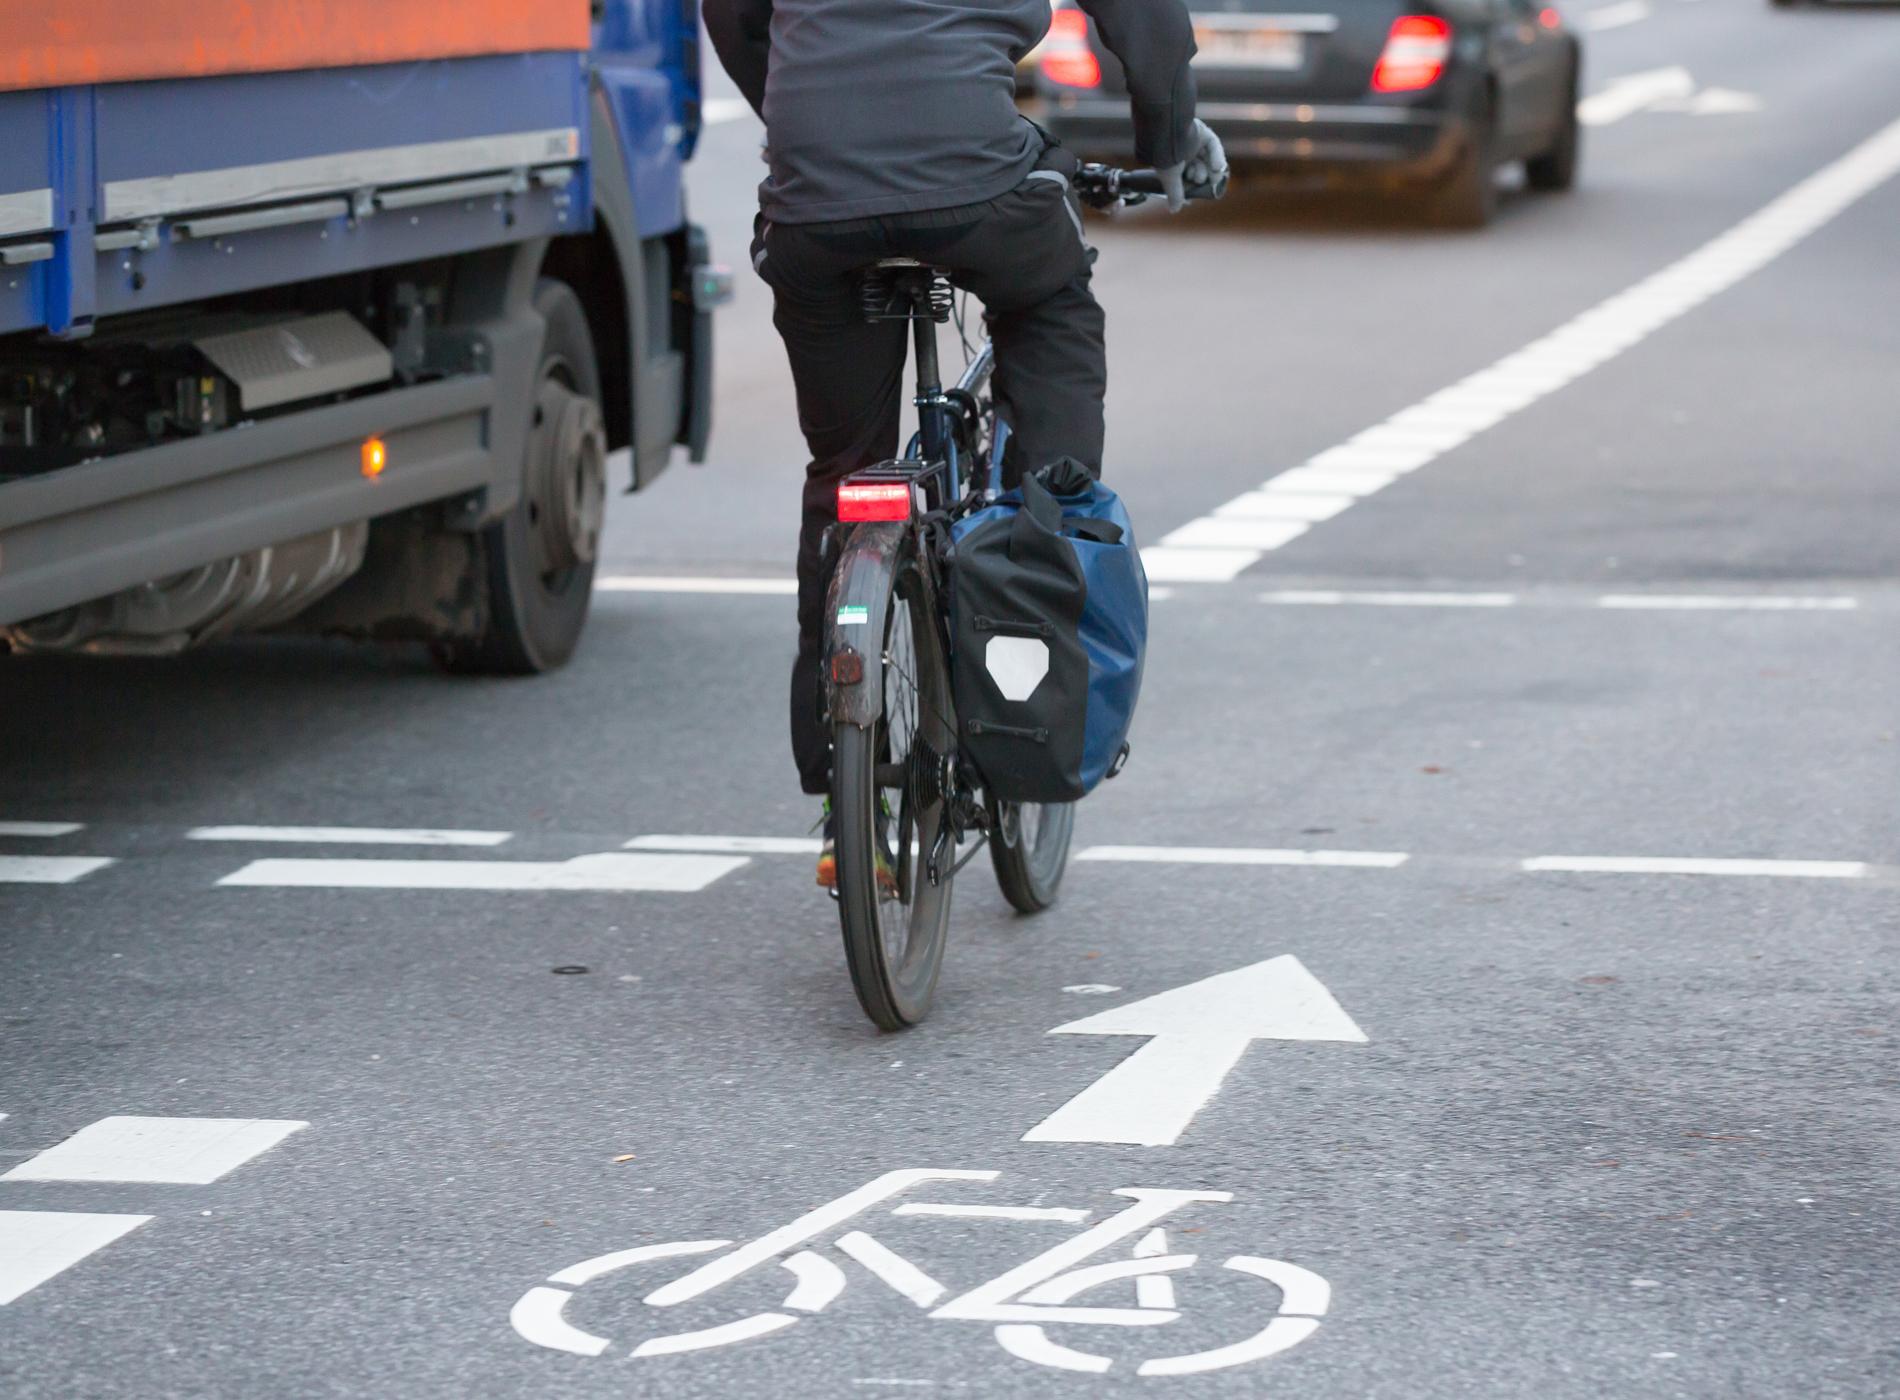 Fahrradfahrer neben LKW